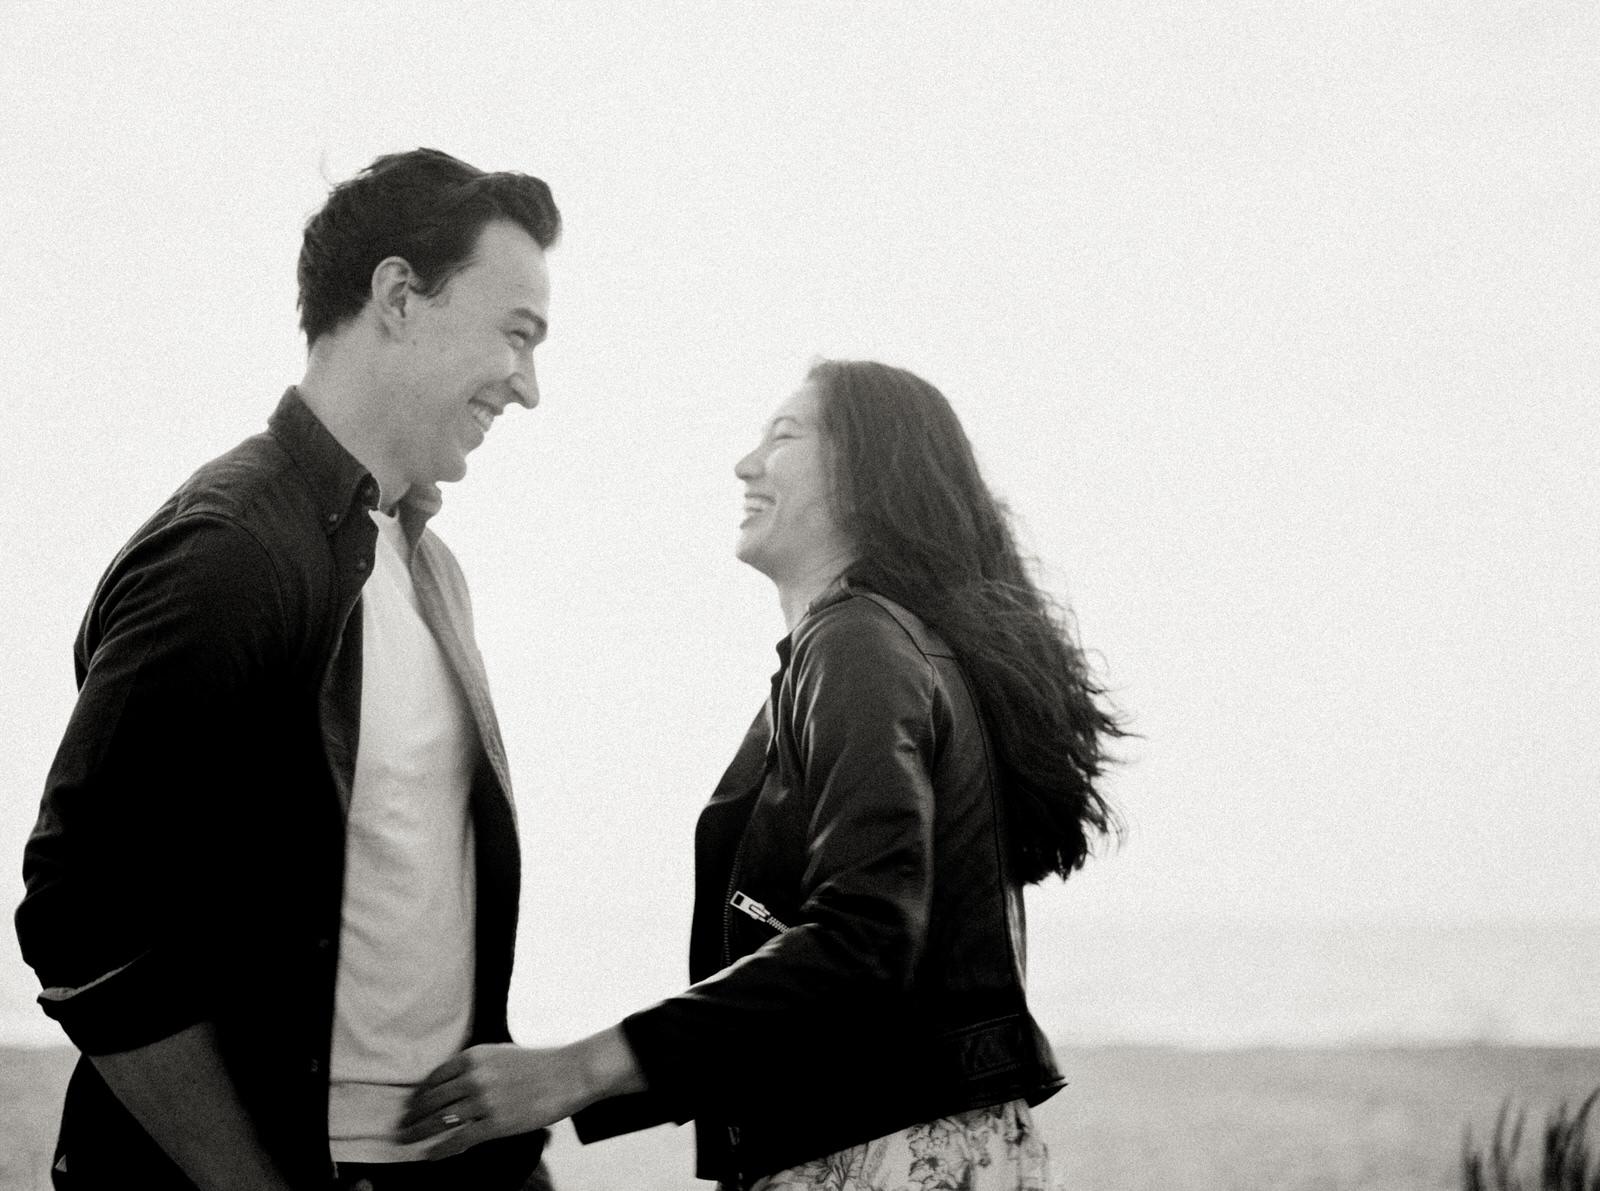 Sai&JackPre-weddingshootbyImogenXiana-23